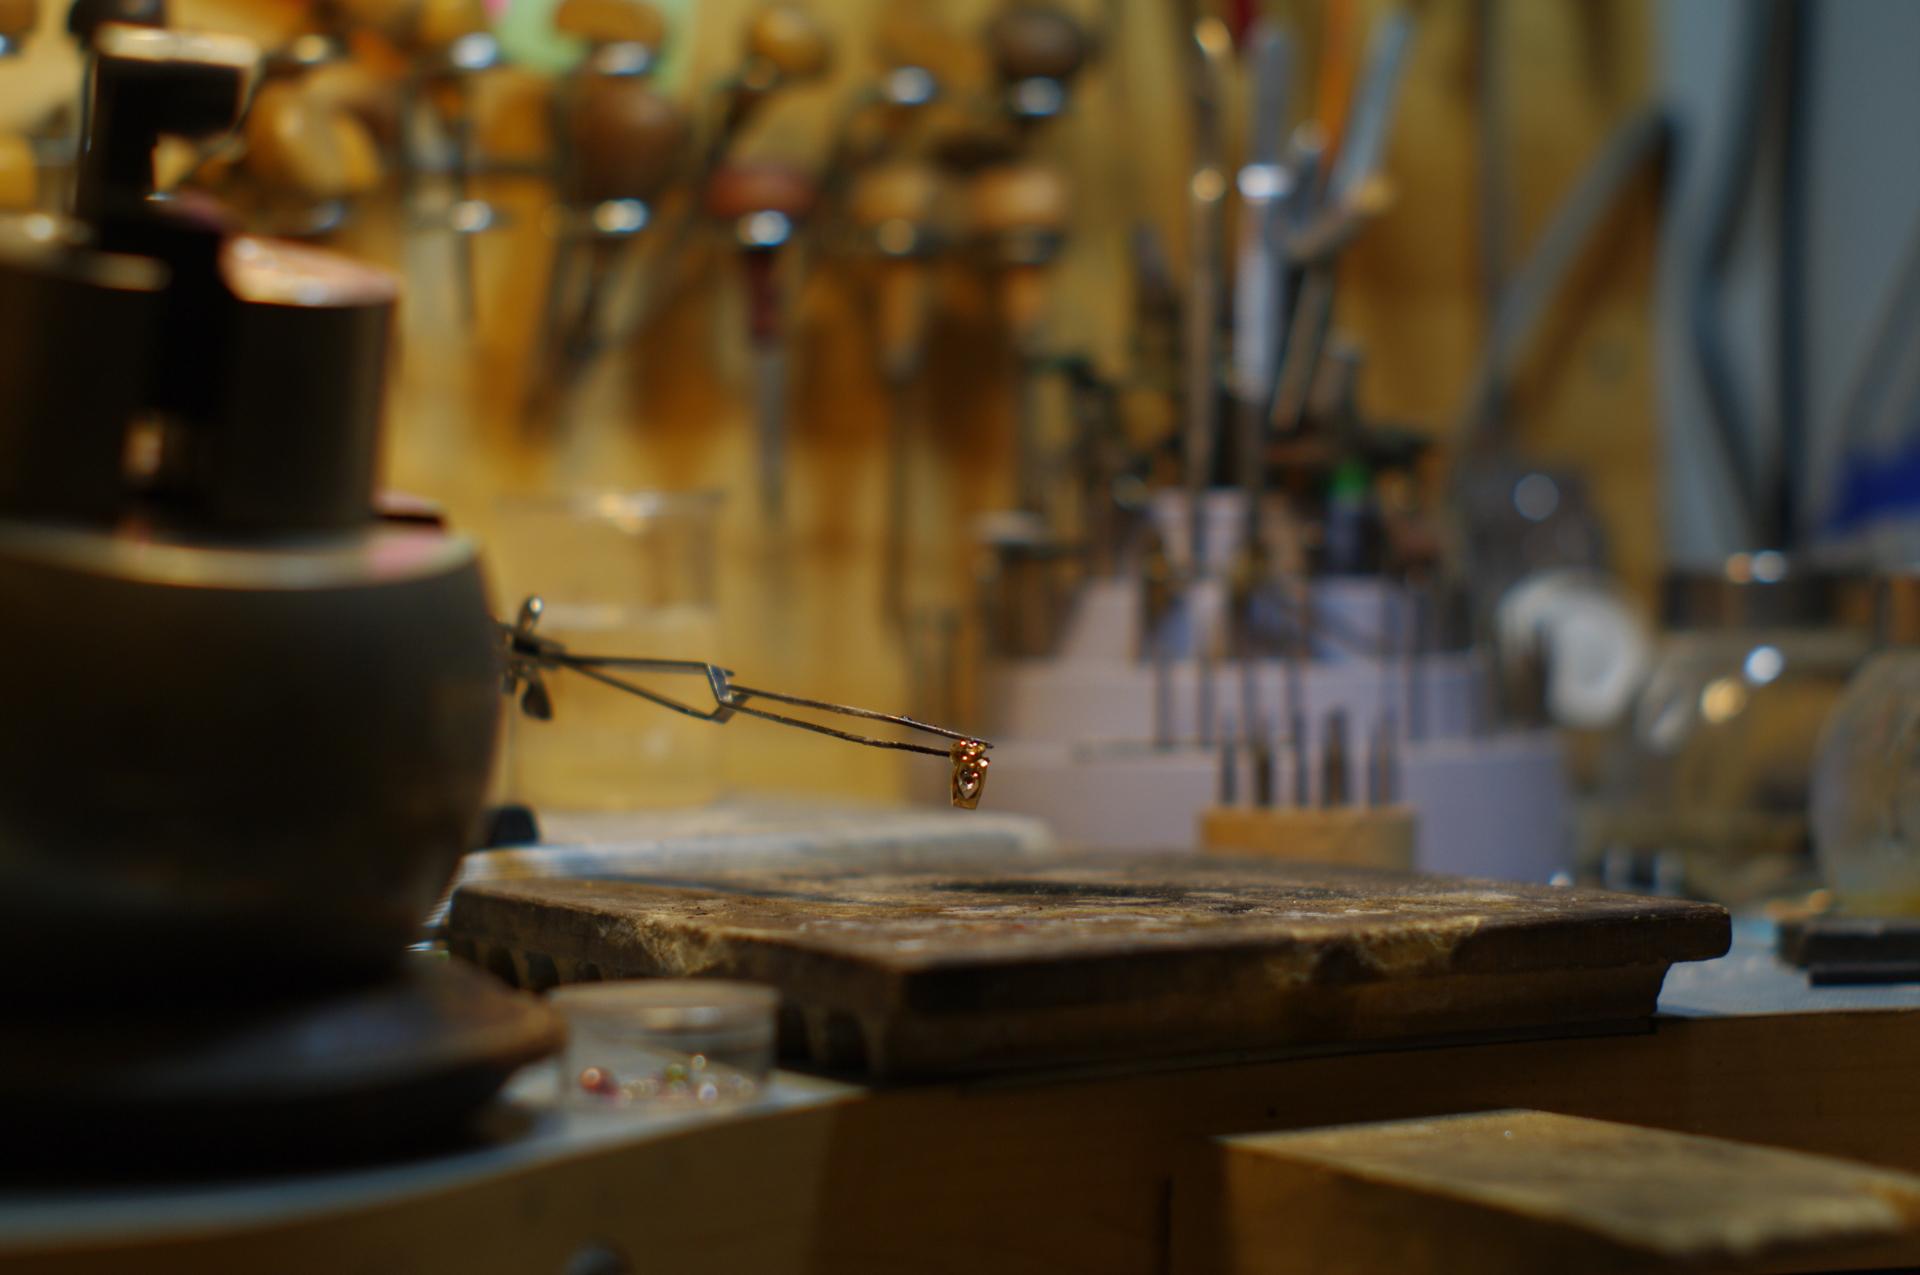 jewellery repair at maf goldsmith